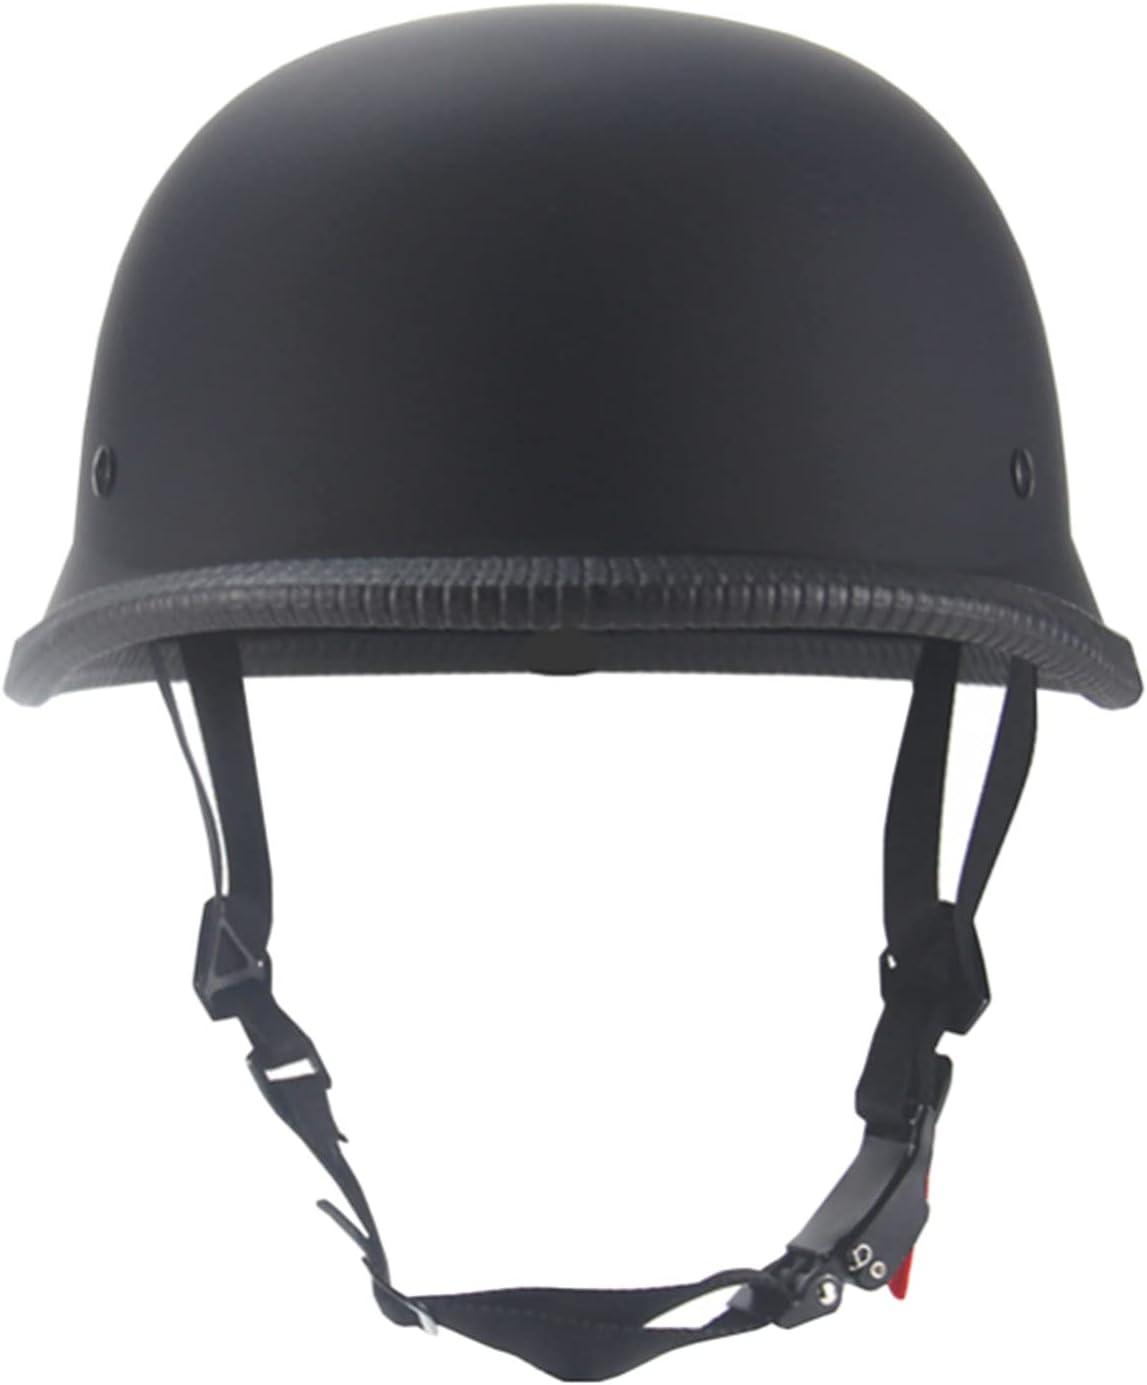 Fashionable LTJLBHJ Skateboard Helmet Racing Brand new Motorcycle Cap Modeling